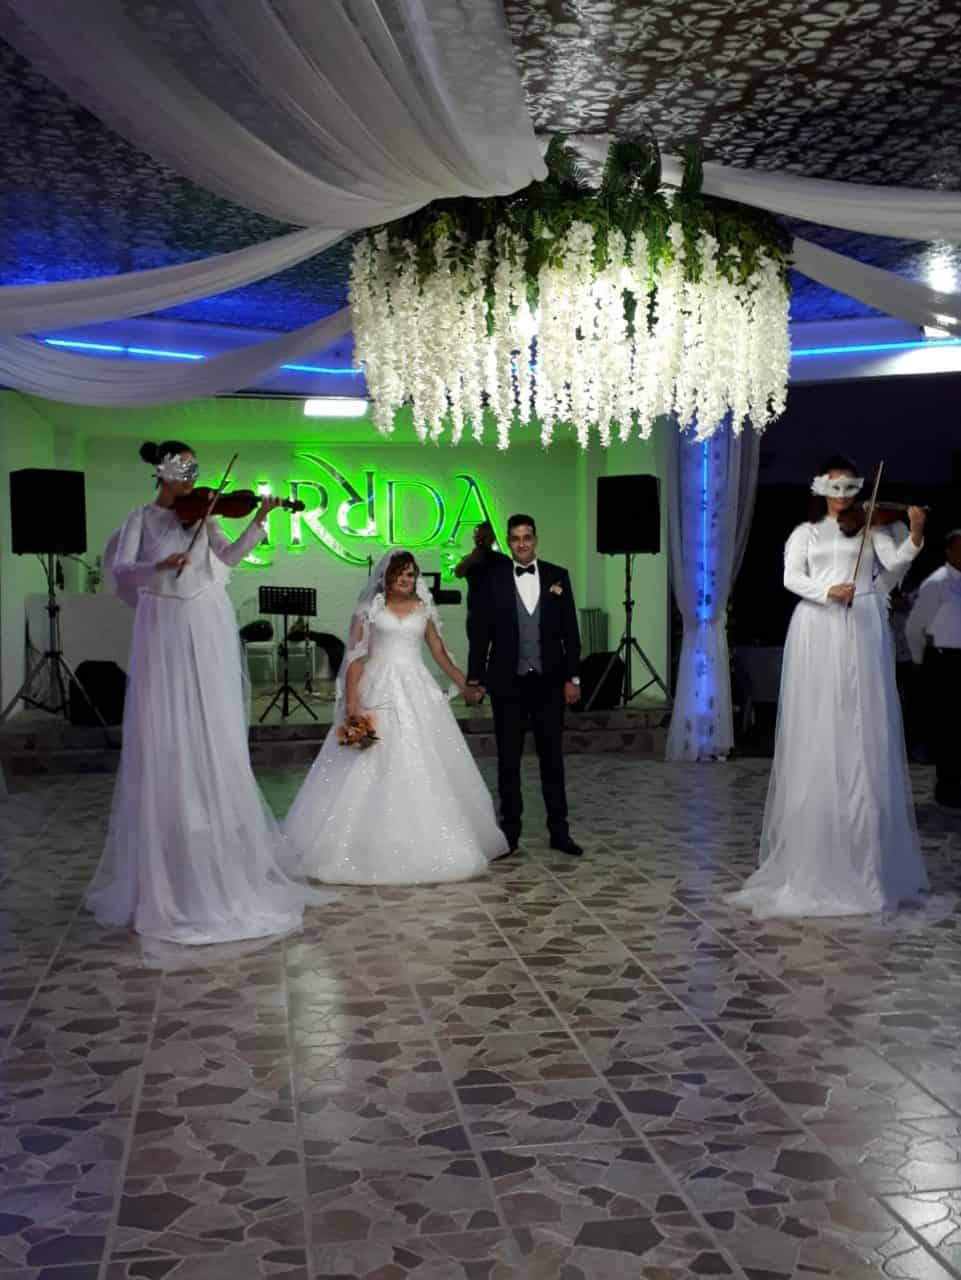 kirrda-312-wedding-yenimahalle-10.jpg